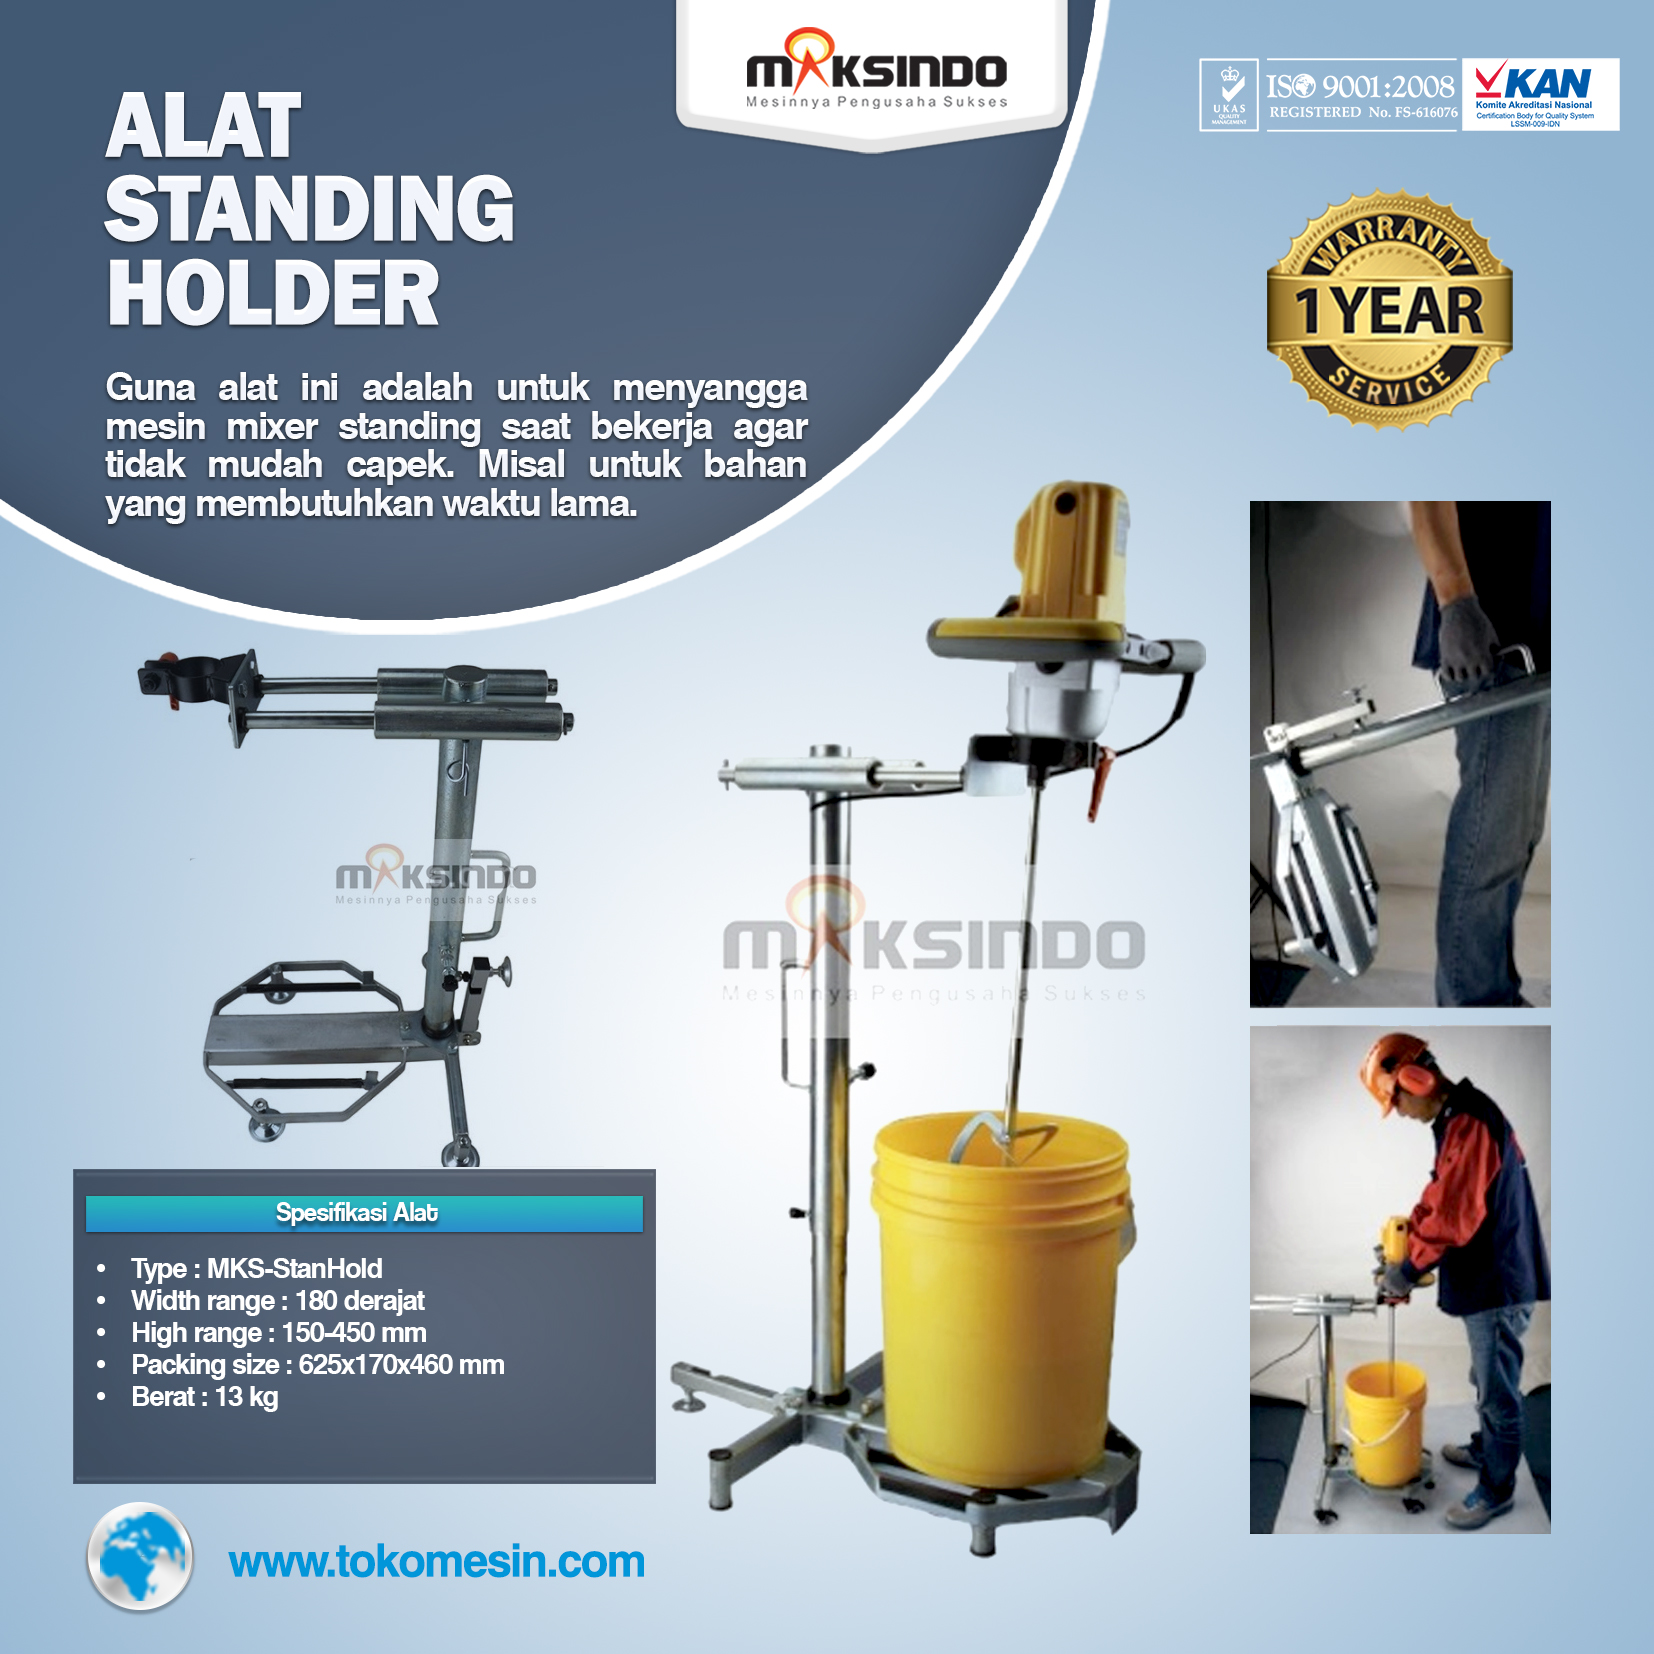 Alat Standing Holder